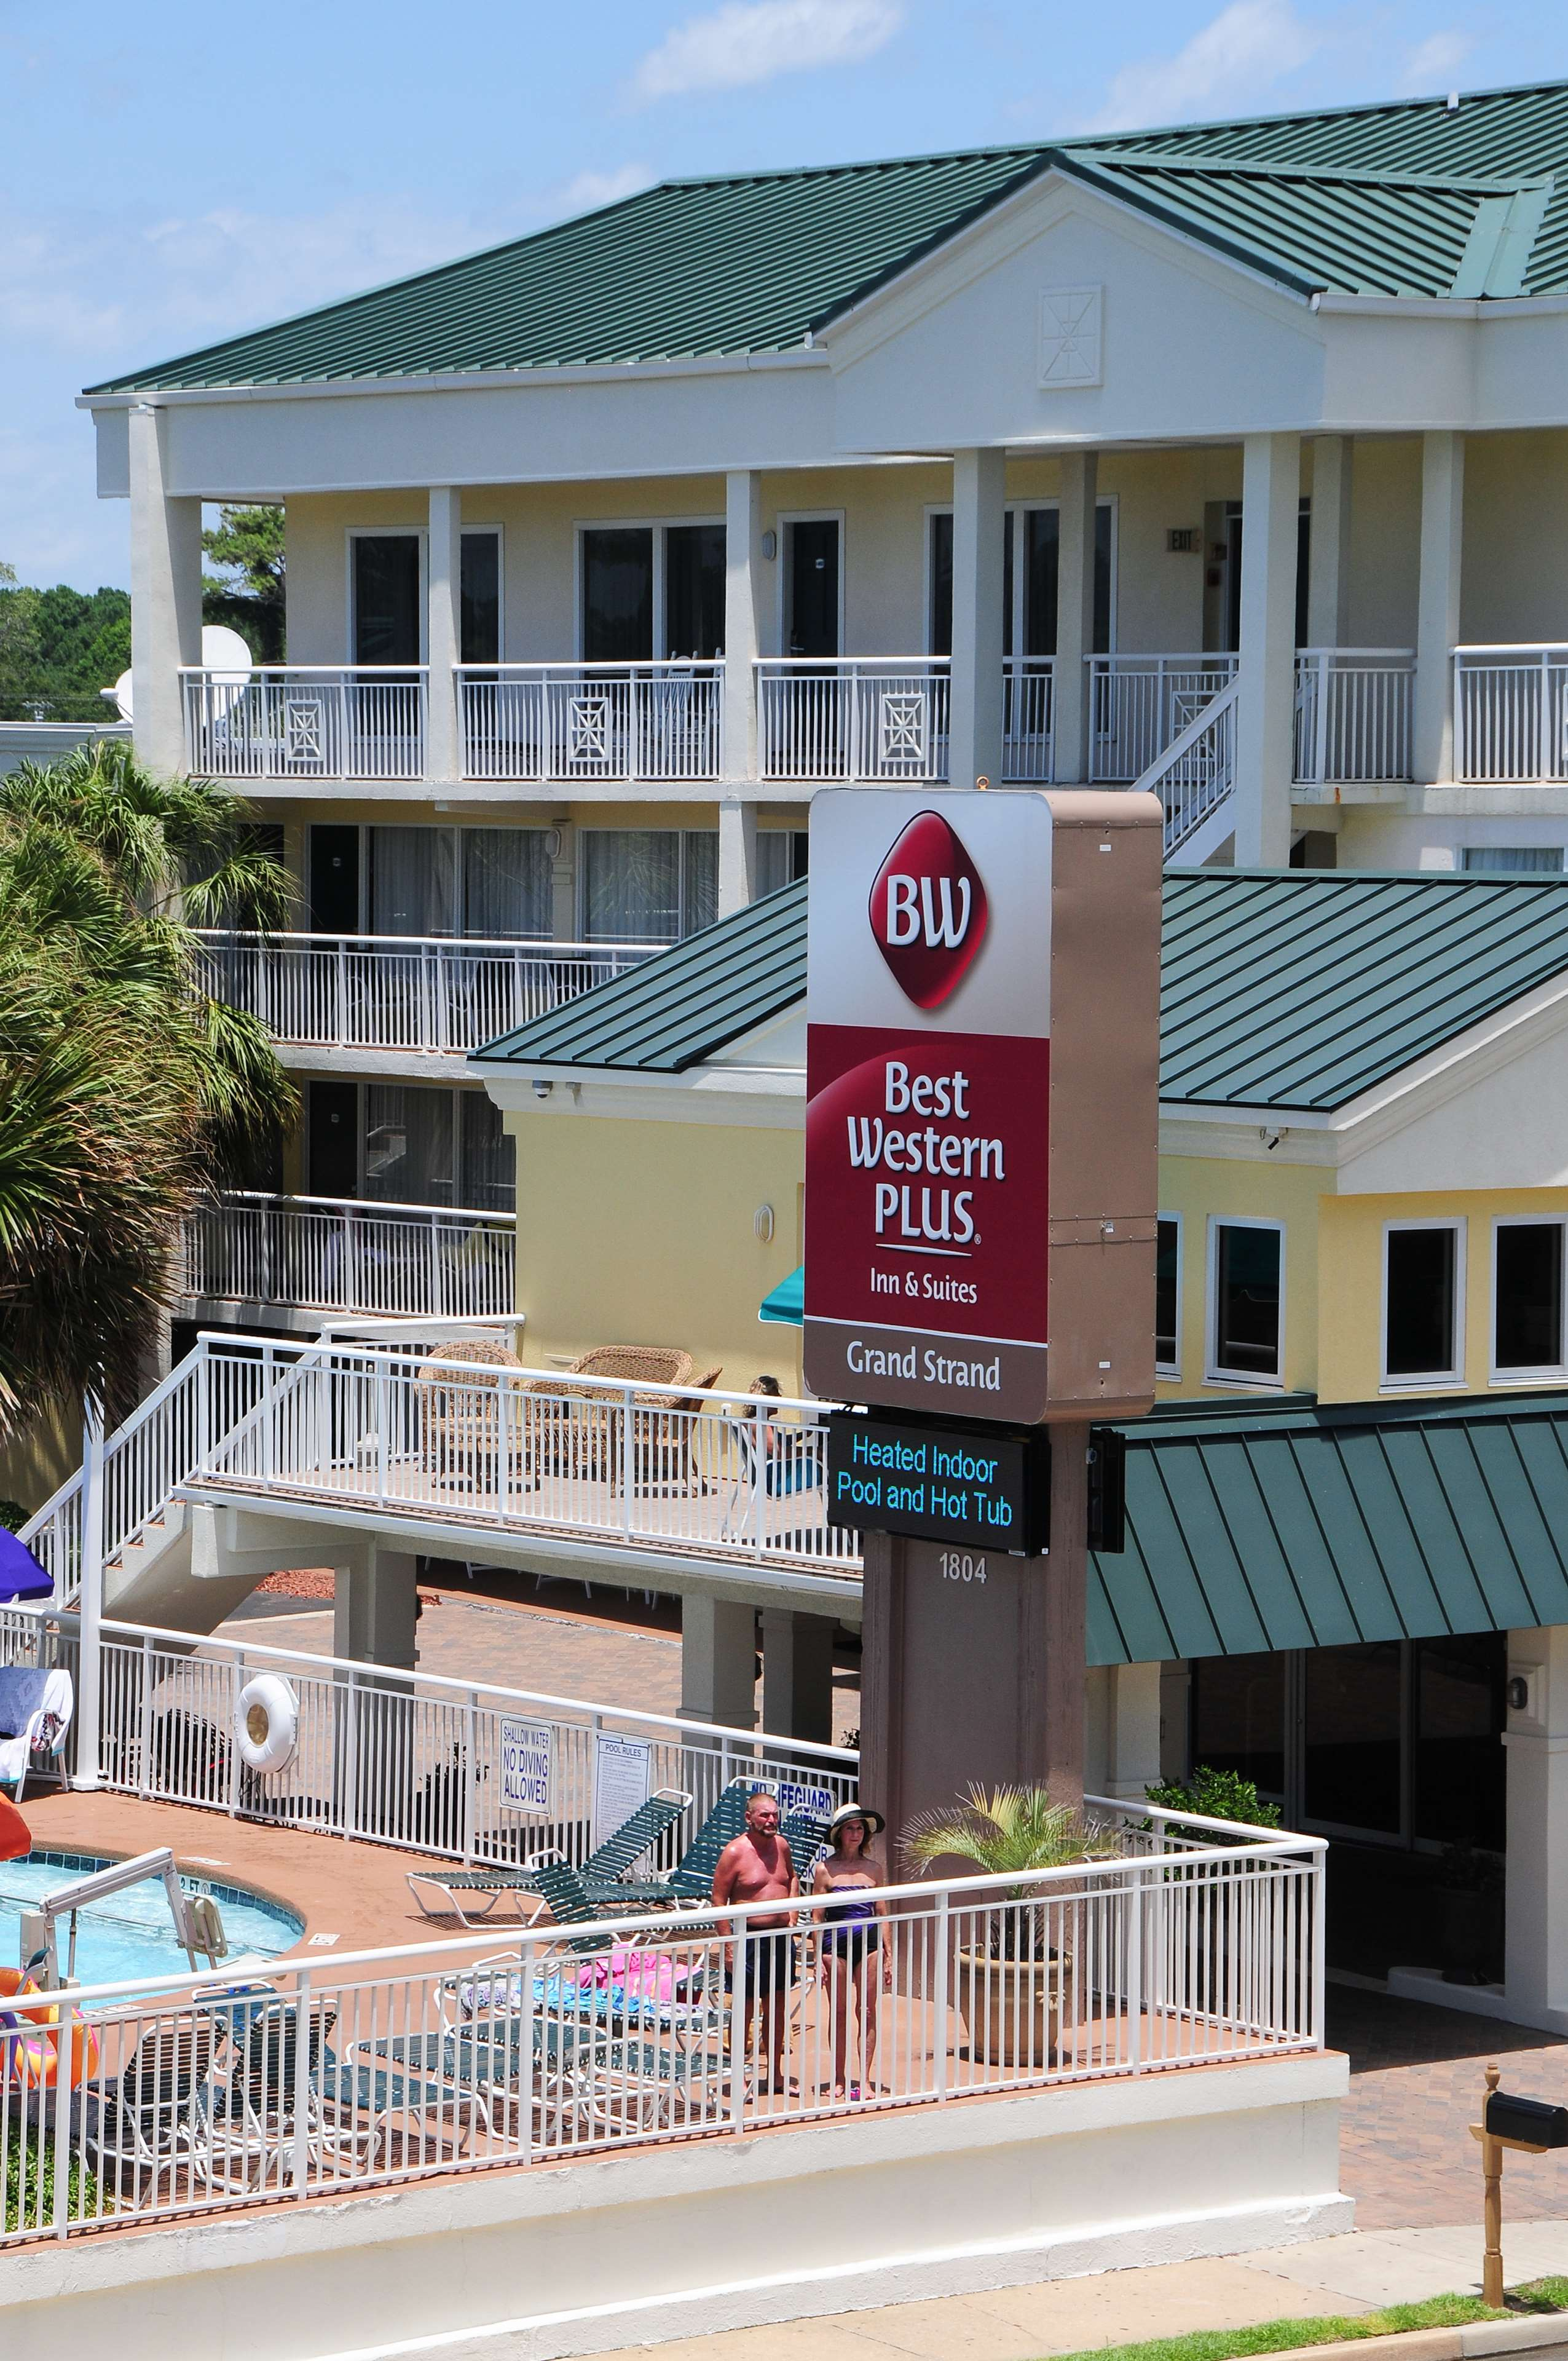 Best Western Plus Grand Strand Inn & Suites image 7